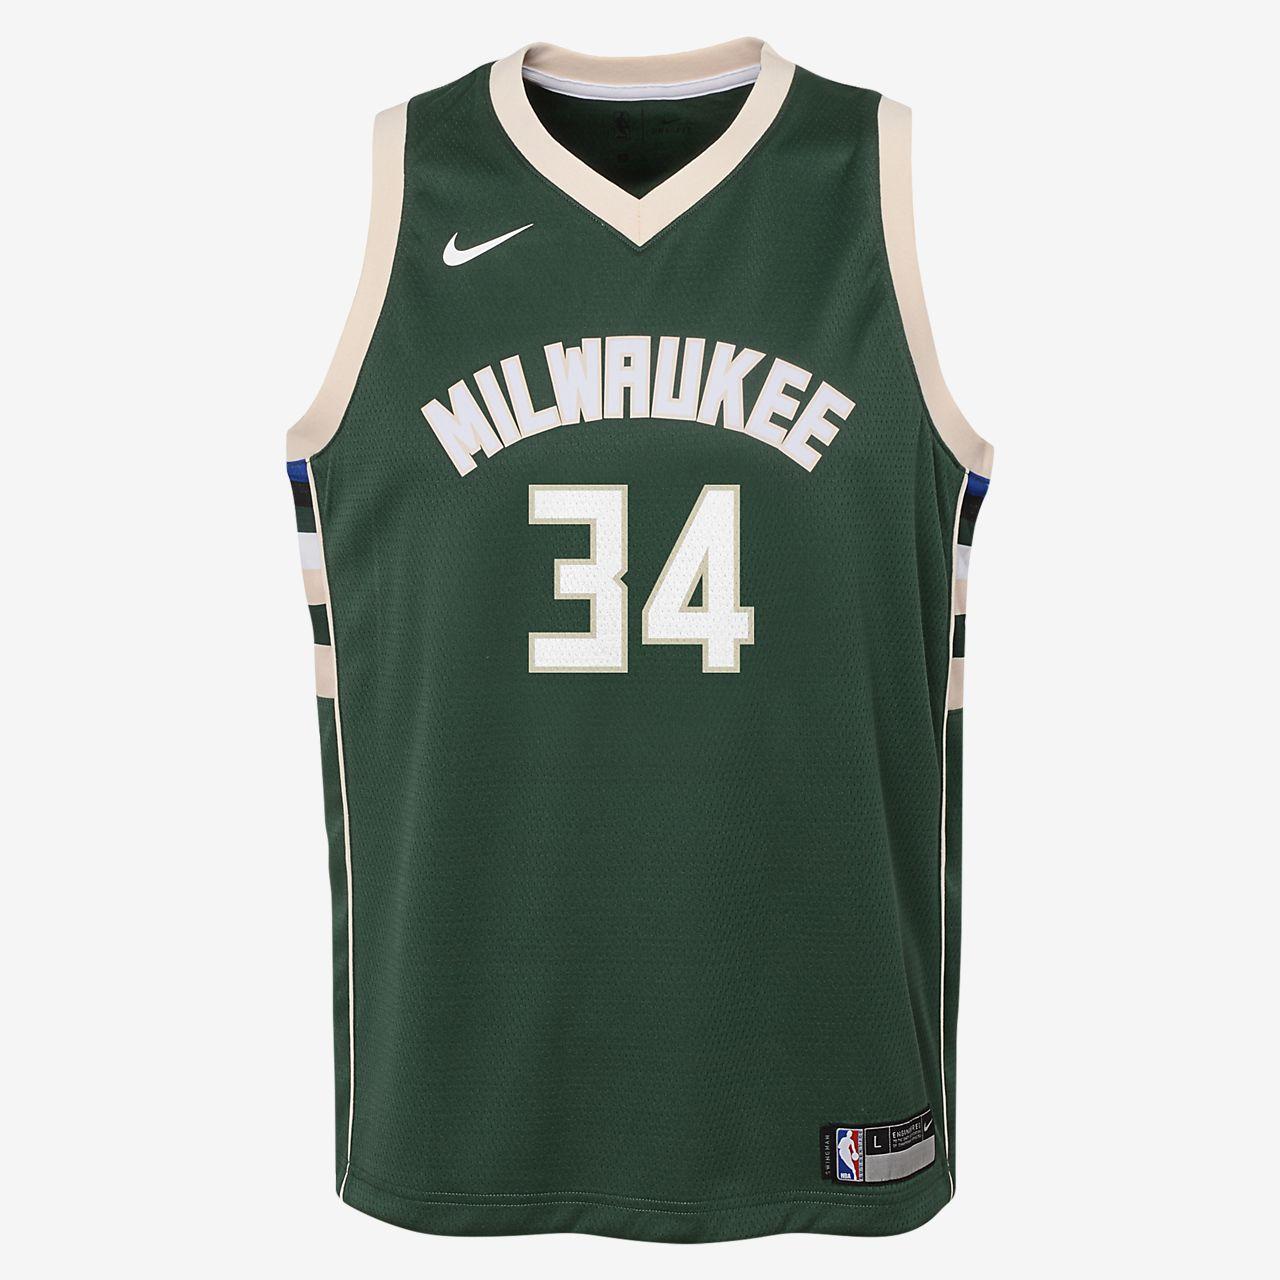 Giannis Antetokounmpo Milwaukee Bucks Nike Icon Edition Swingman Older Kids' NBA Jersey